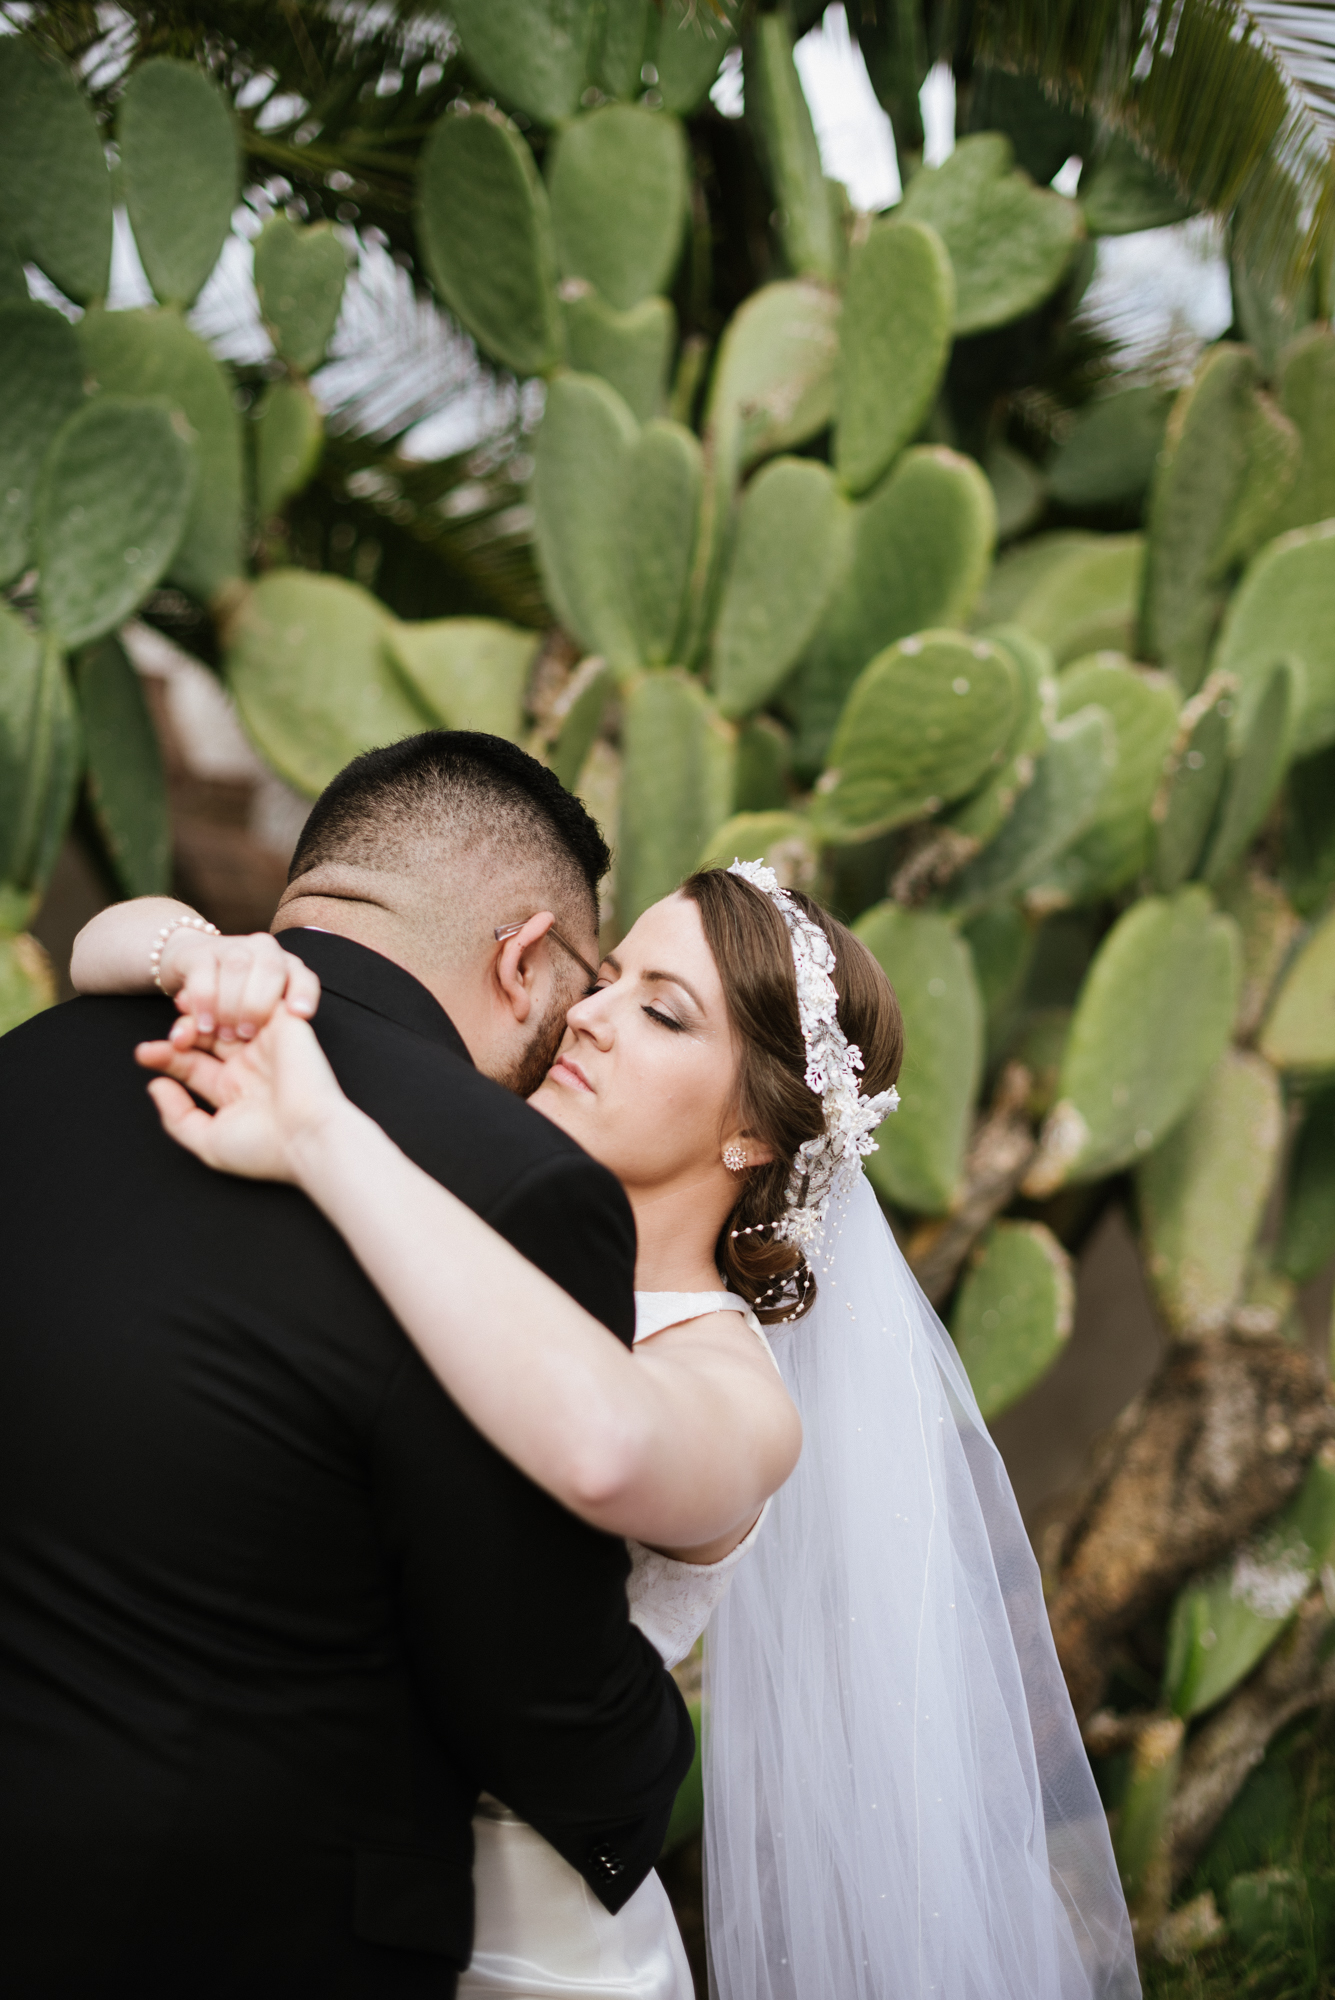 TucsonMuseumofArt_Wedding3.jpg